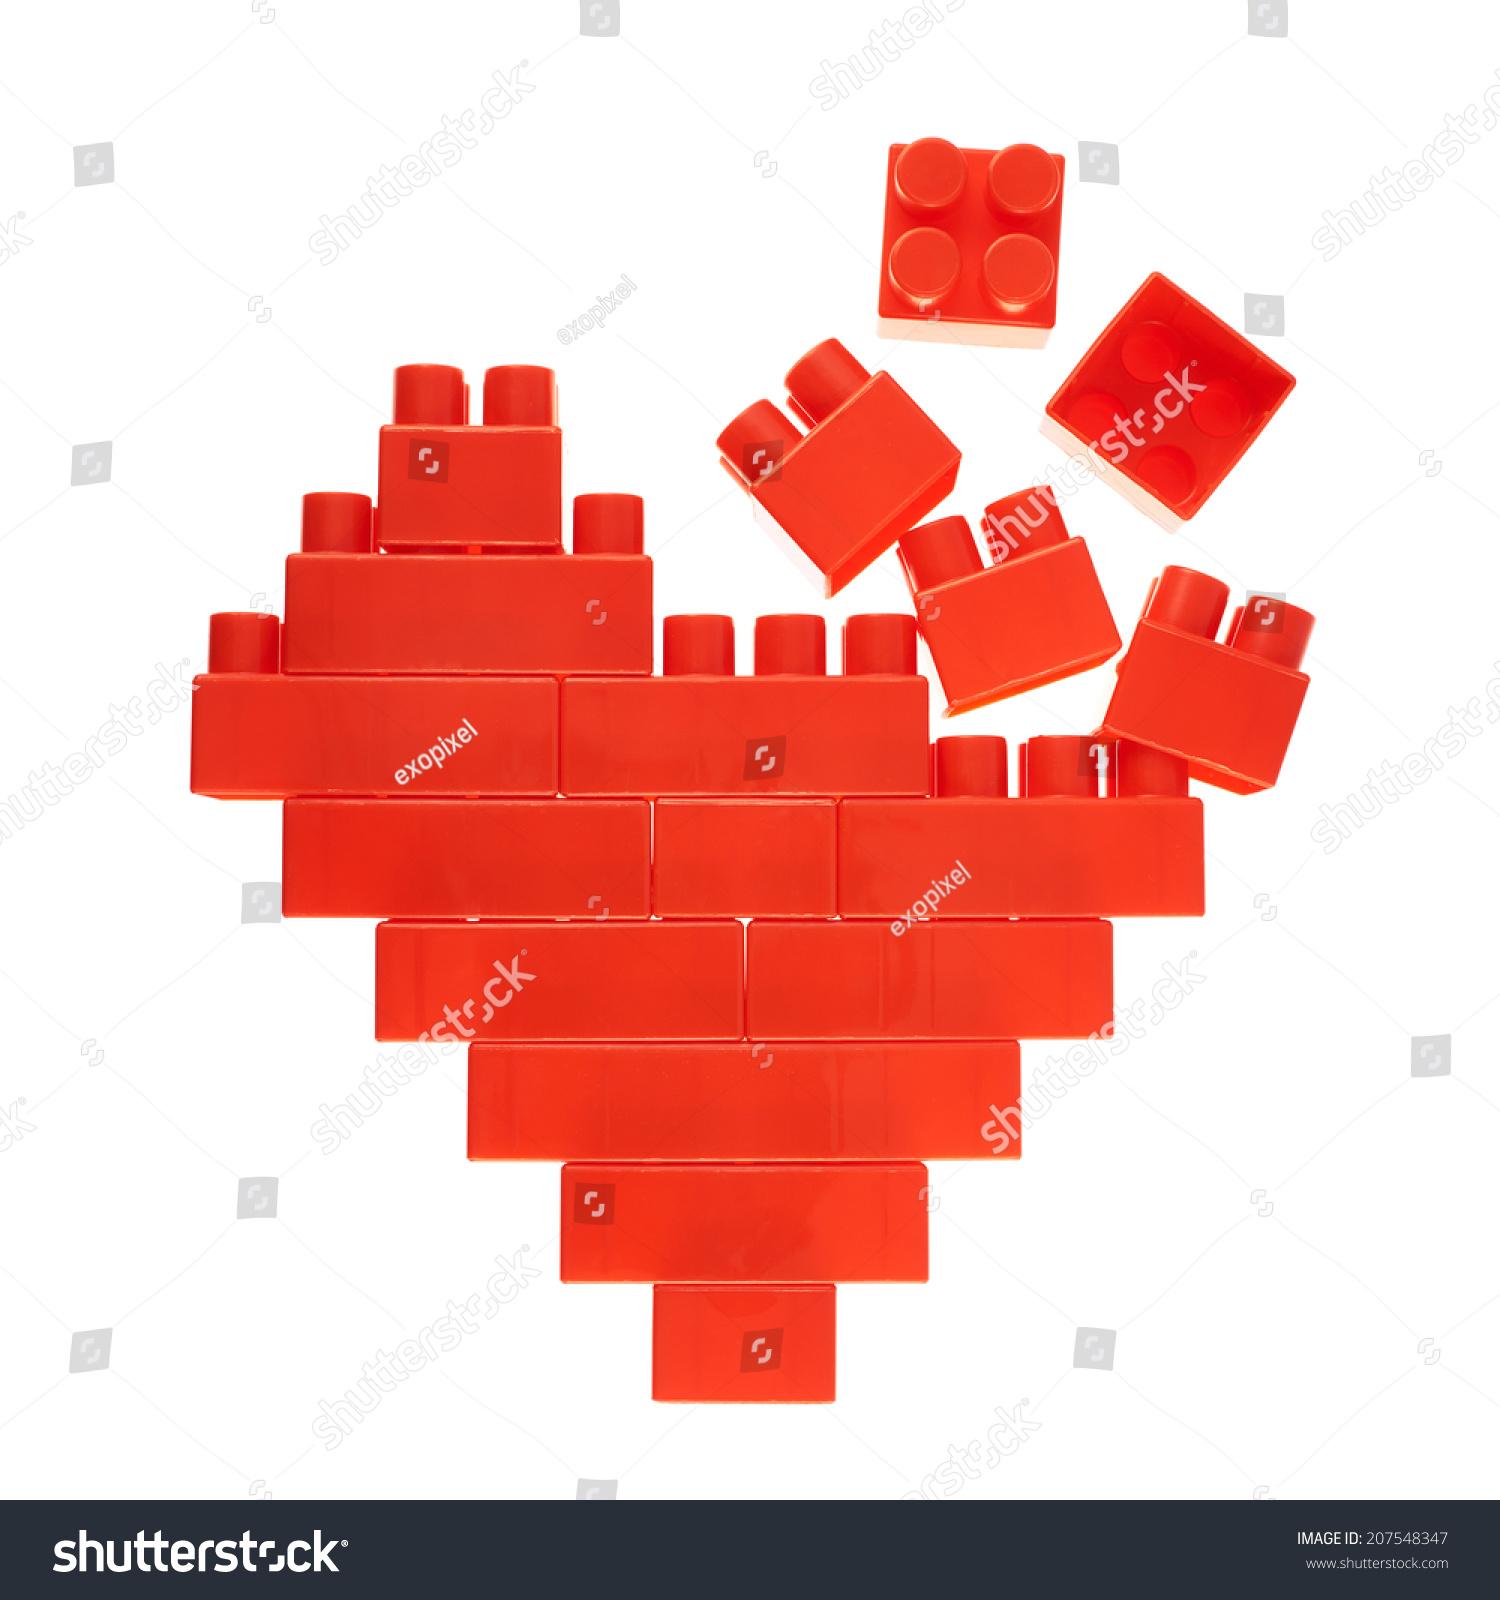 Broken heart symbol made red plastic stock photo 207548347 broken heart symbol made of red plastic toy construction bricks isolated over the white background buycottarizona